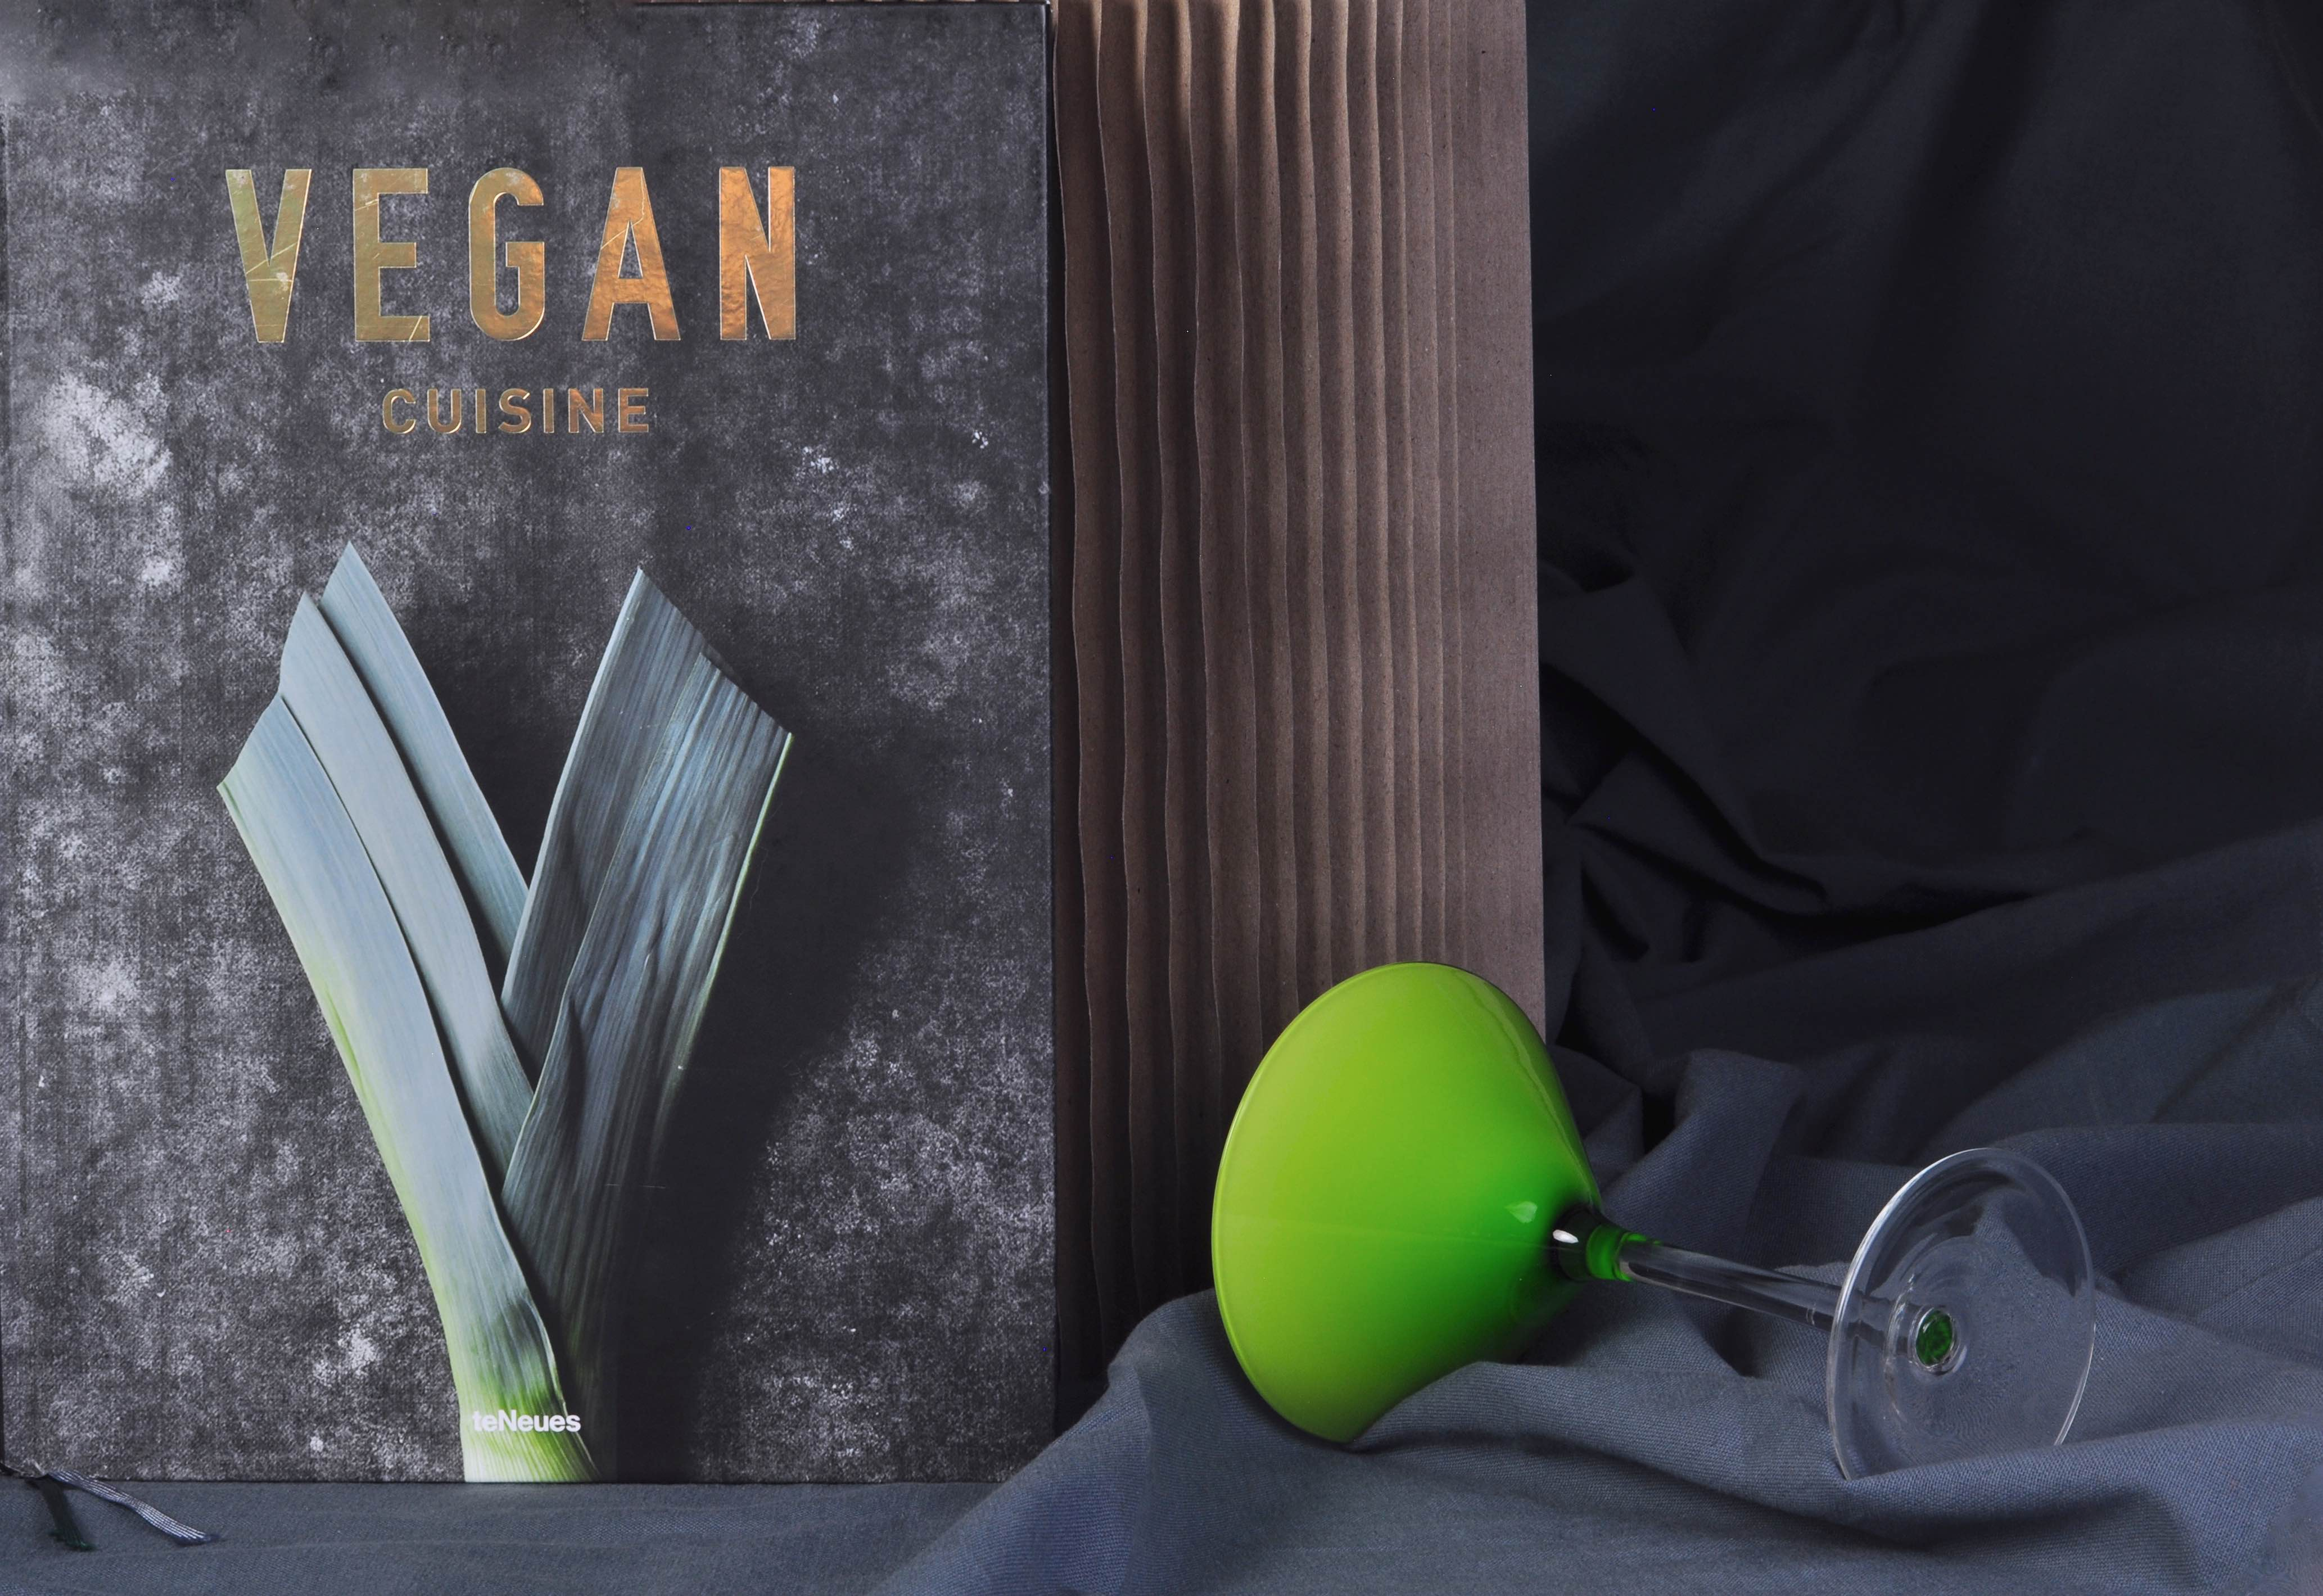 Vegan_cuisine_tastecelebration_com